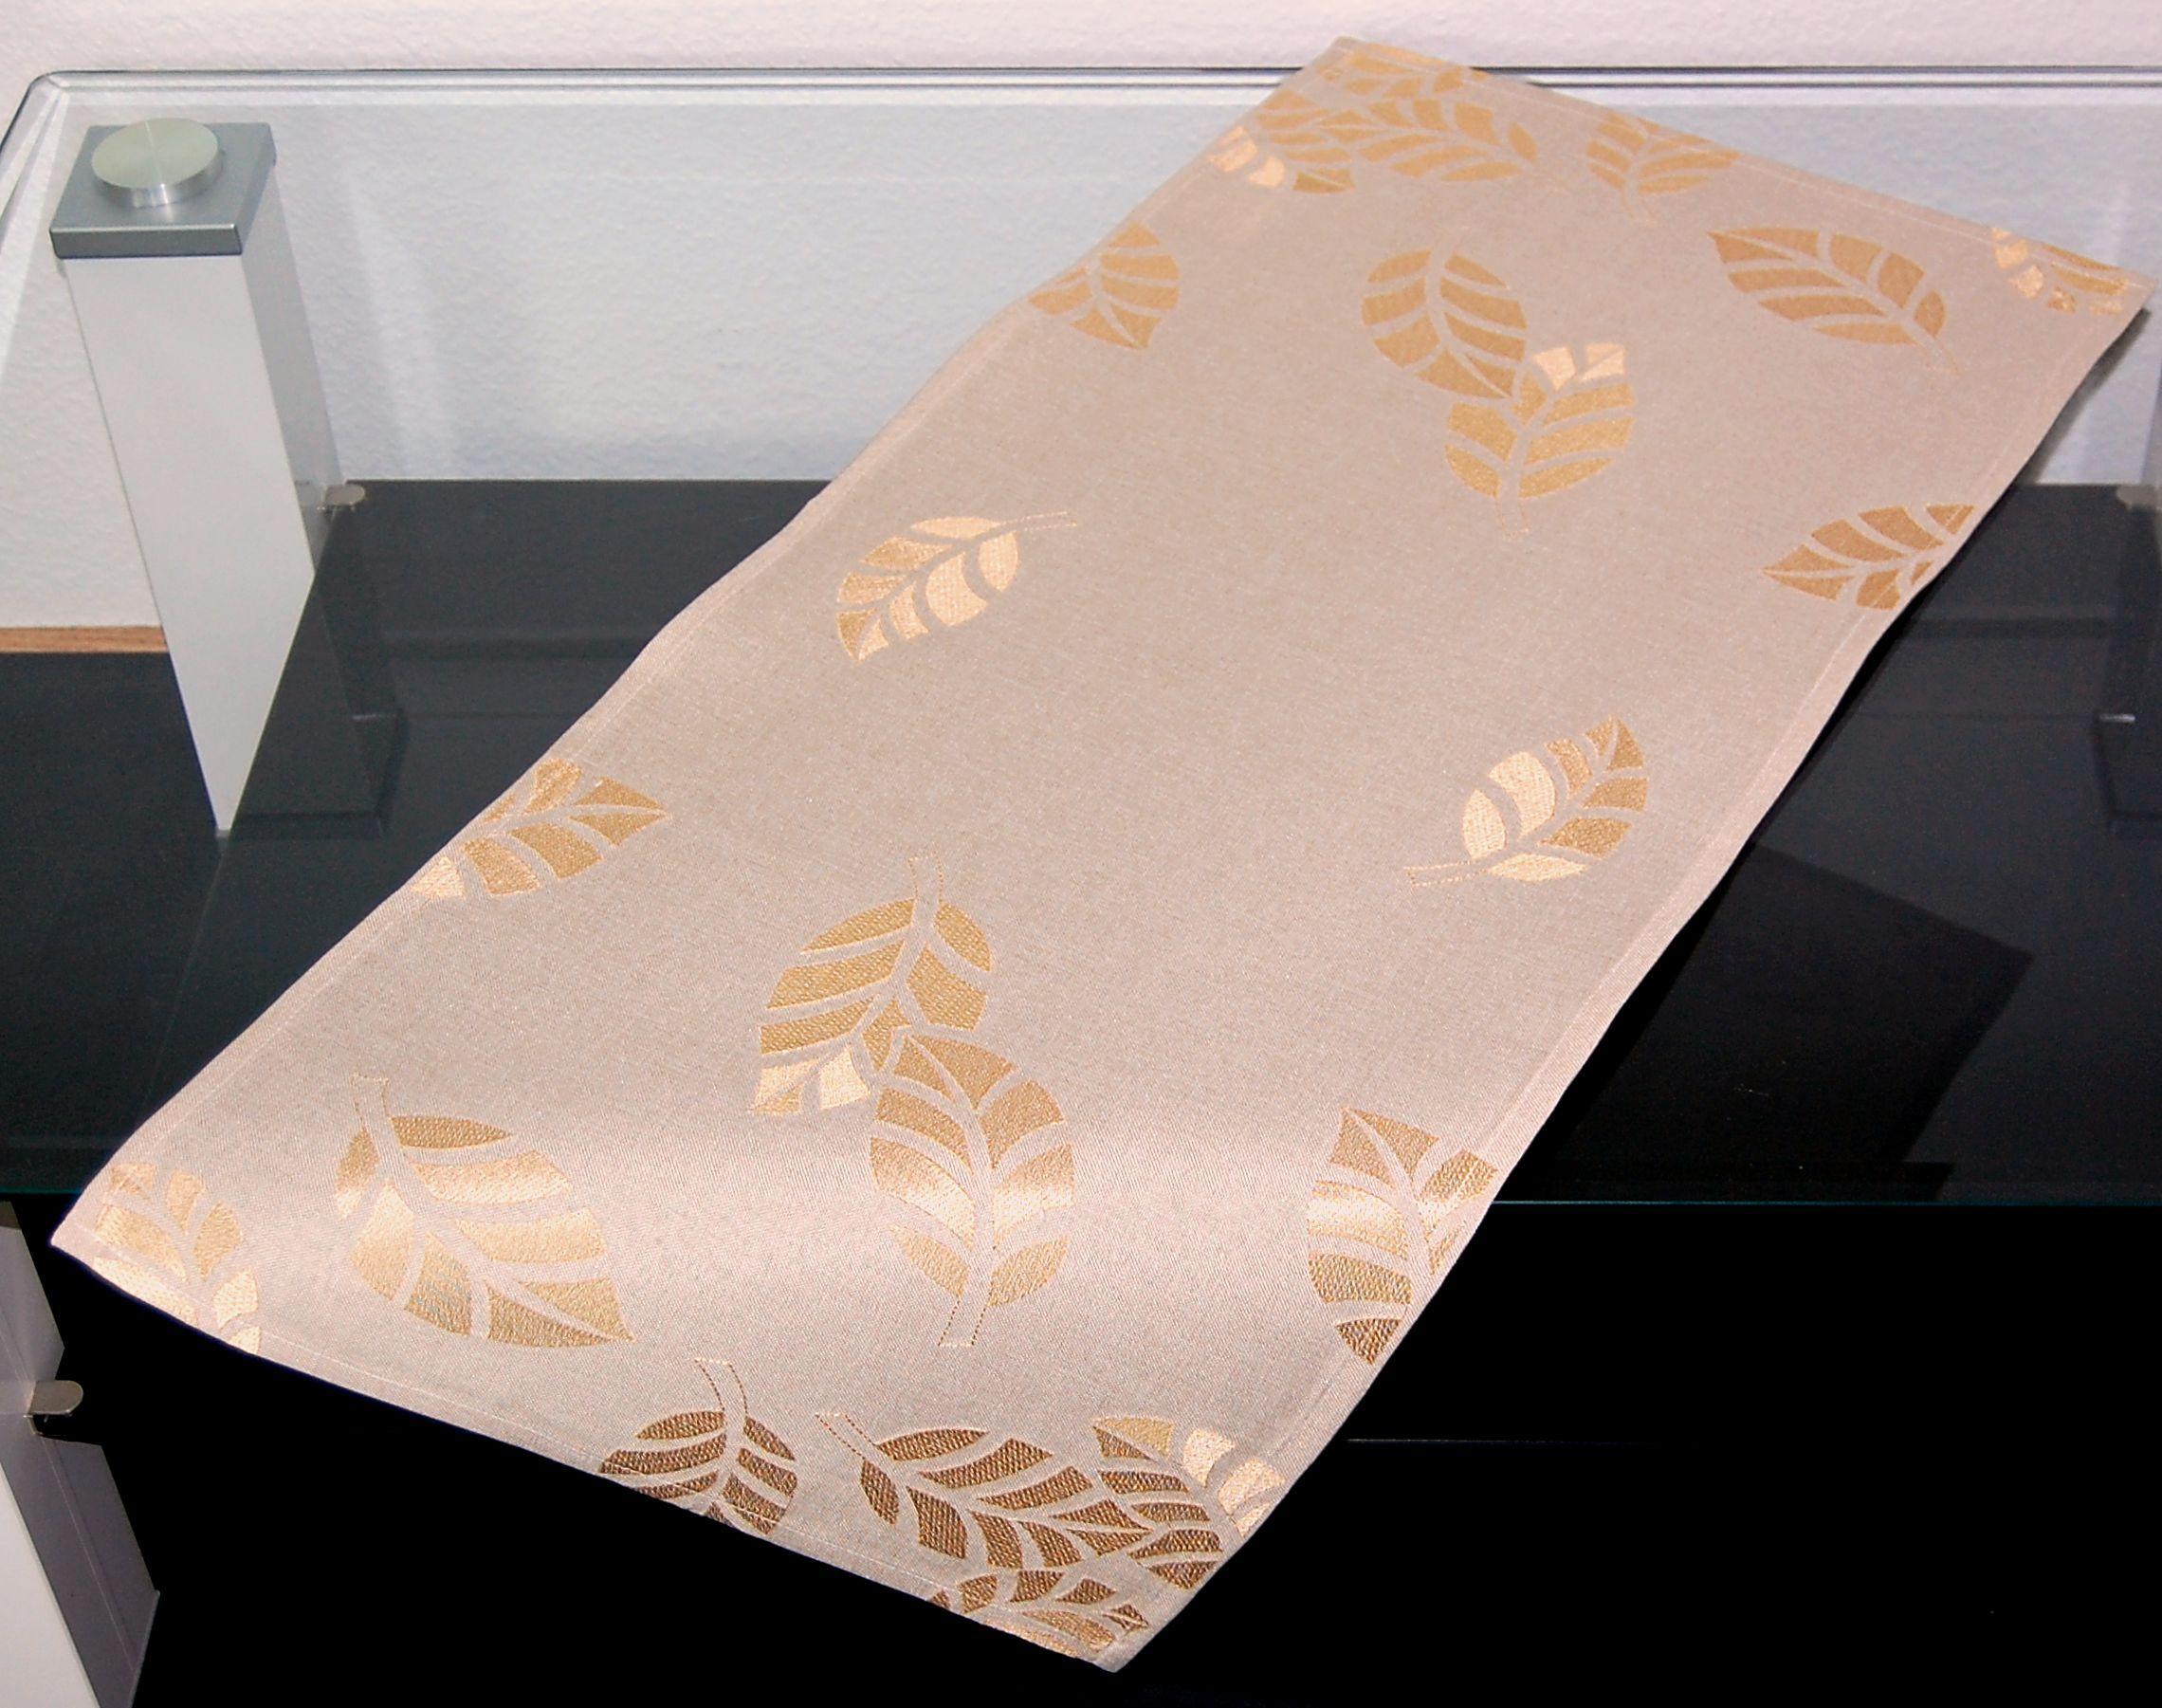 tischdecke beige herbst bl tter ton in ton herbstdecke. Black Bedroom Furniture Sets. Home Design Ideas